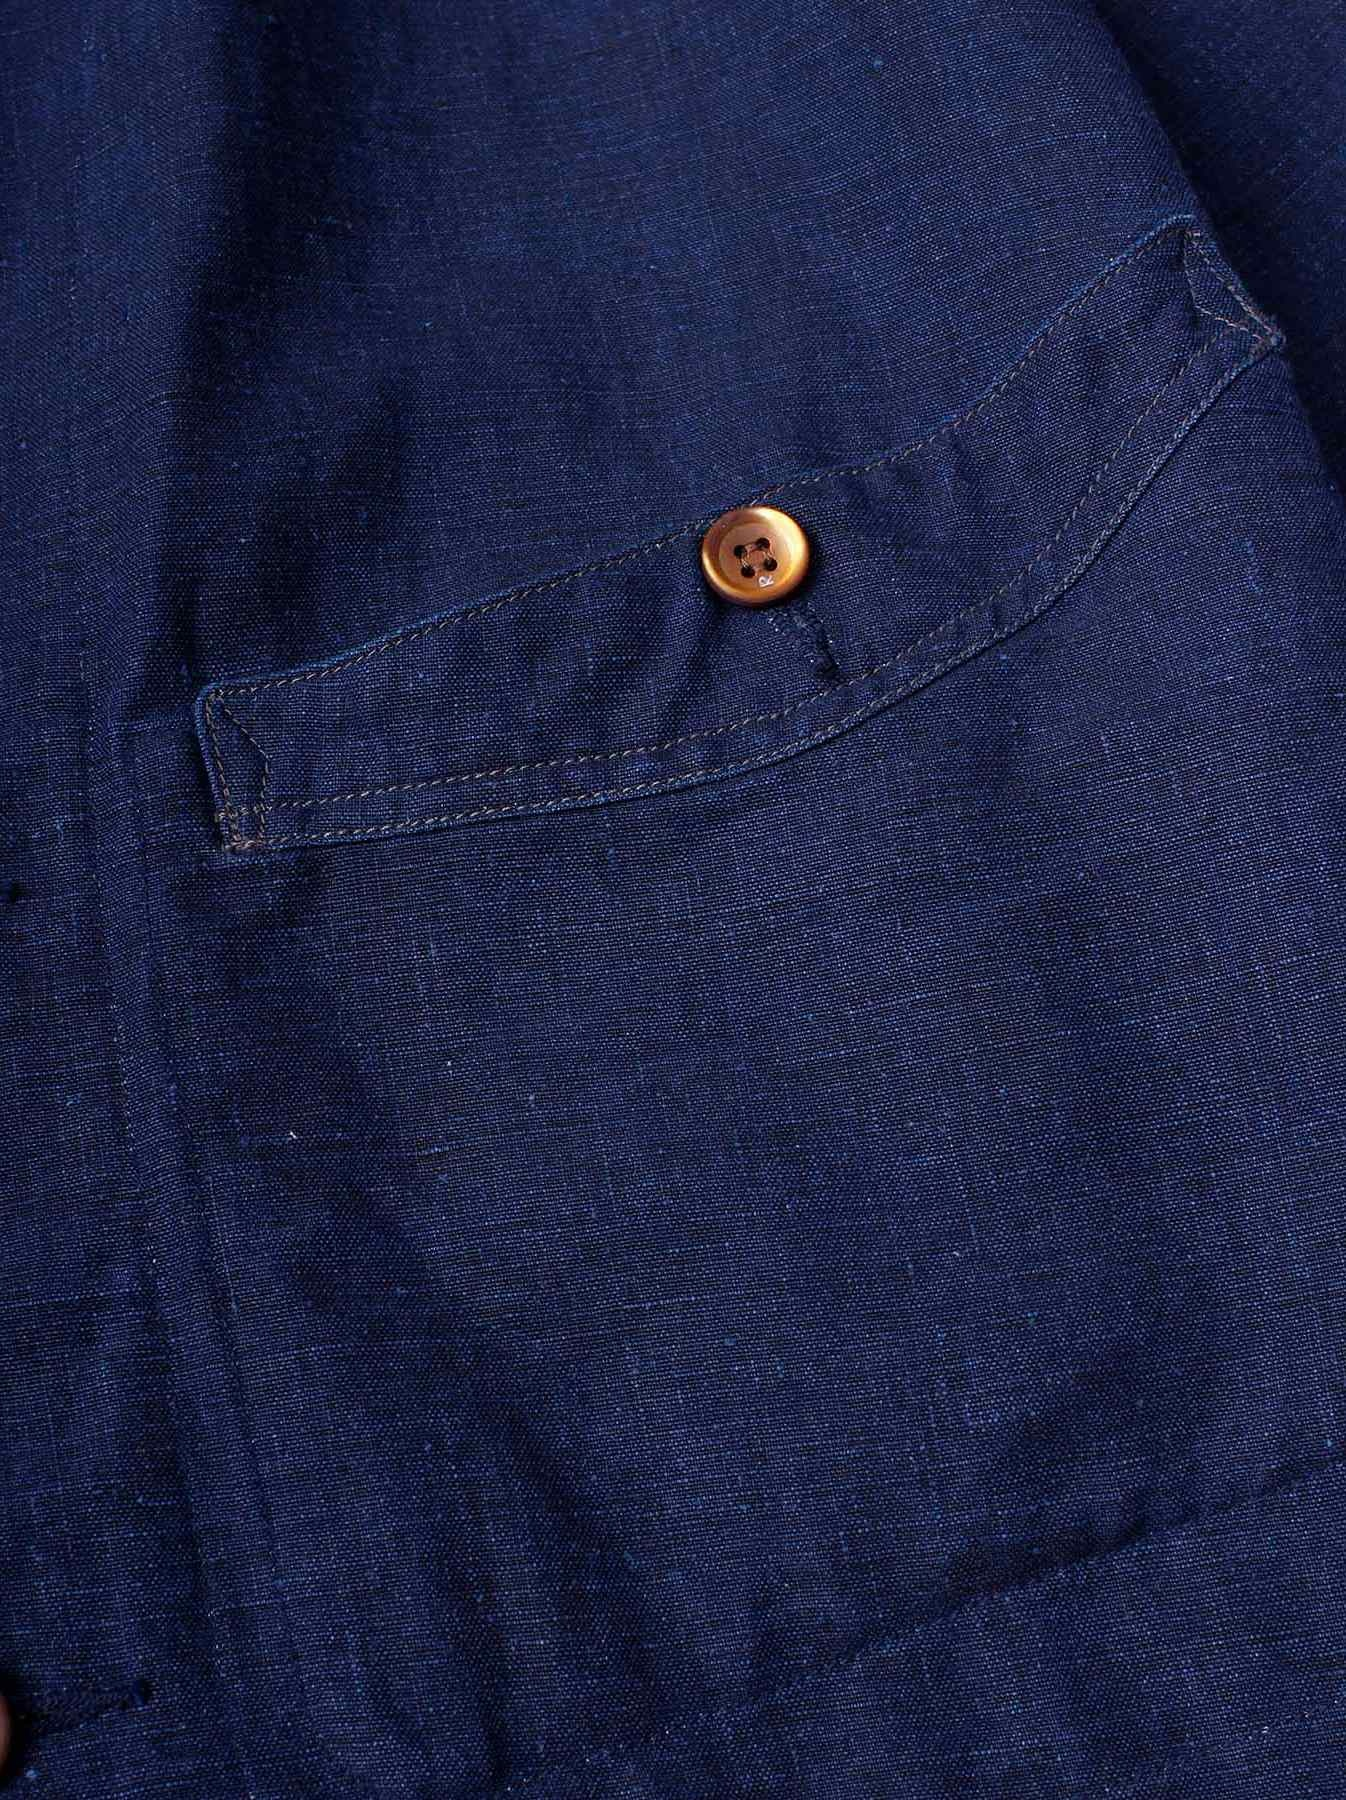 WH Indigo Linen Stand Collar Jacket-9